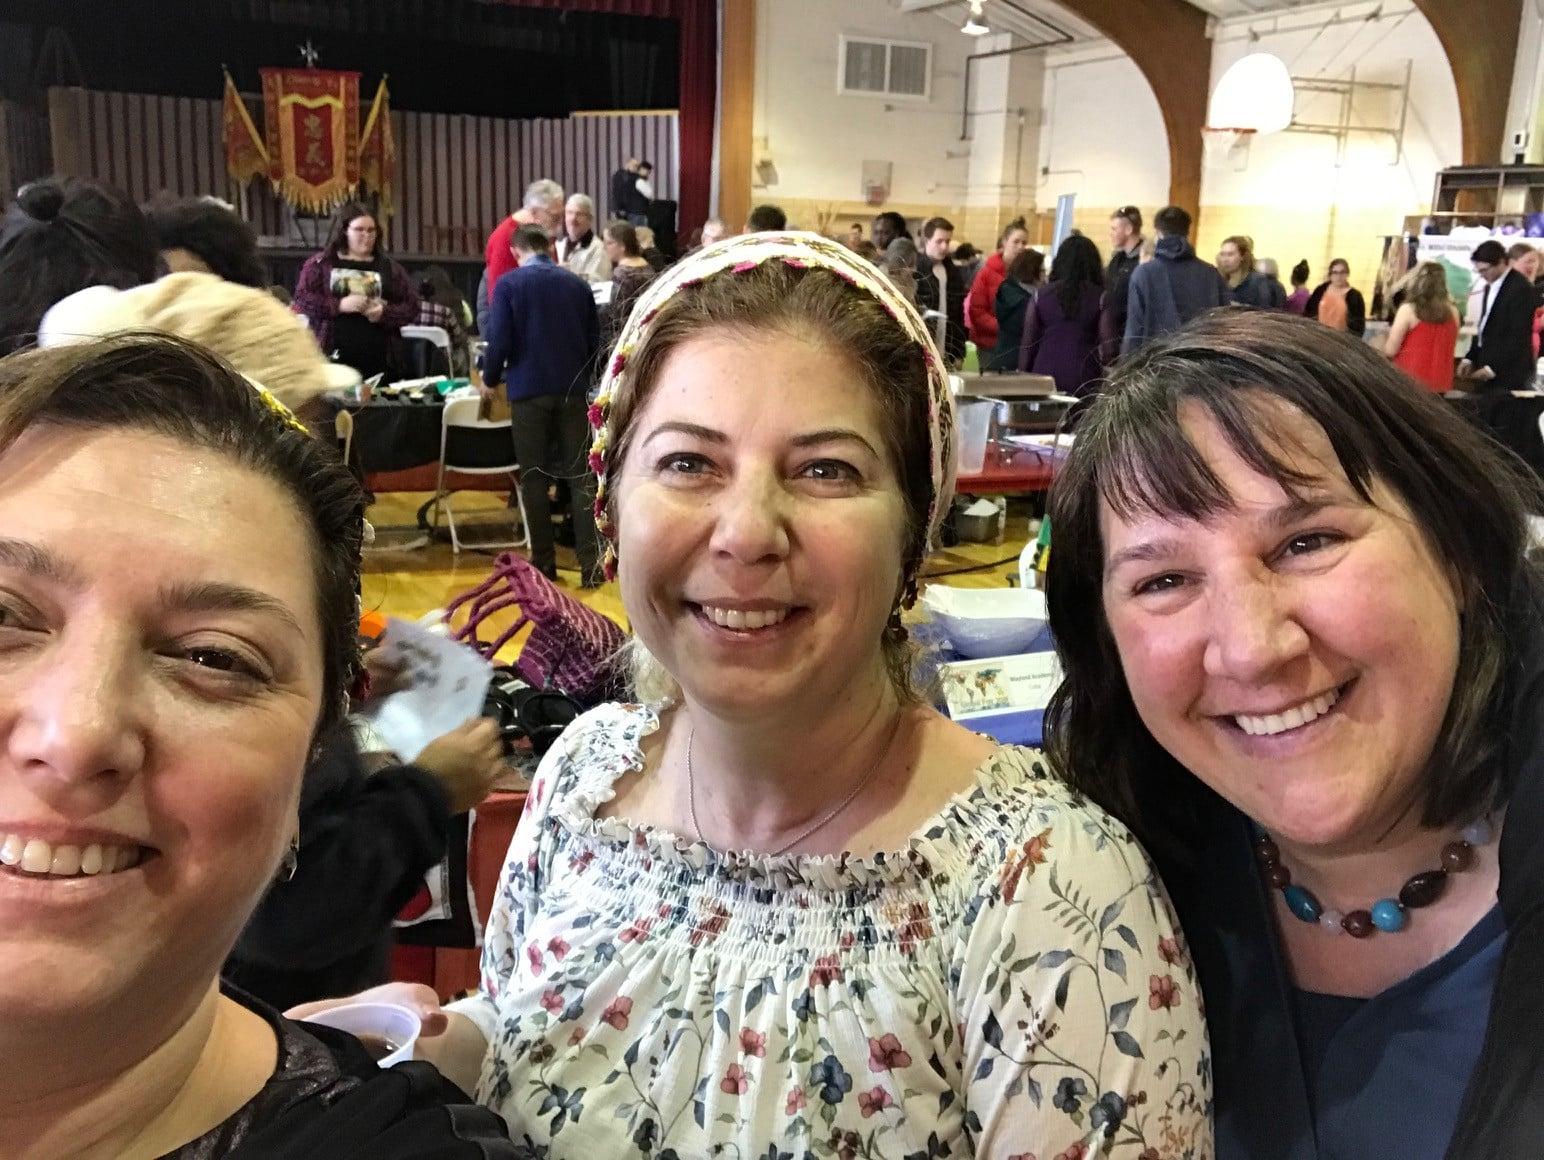 Esra, Mine, and Jennifer Elliott take a selfie together